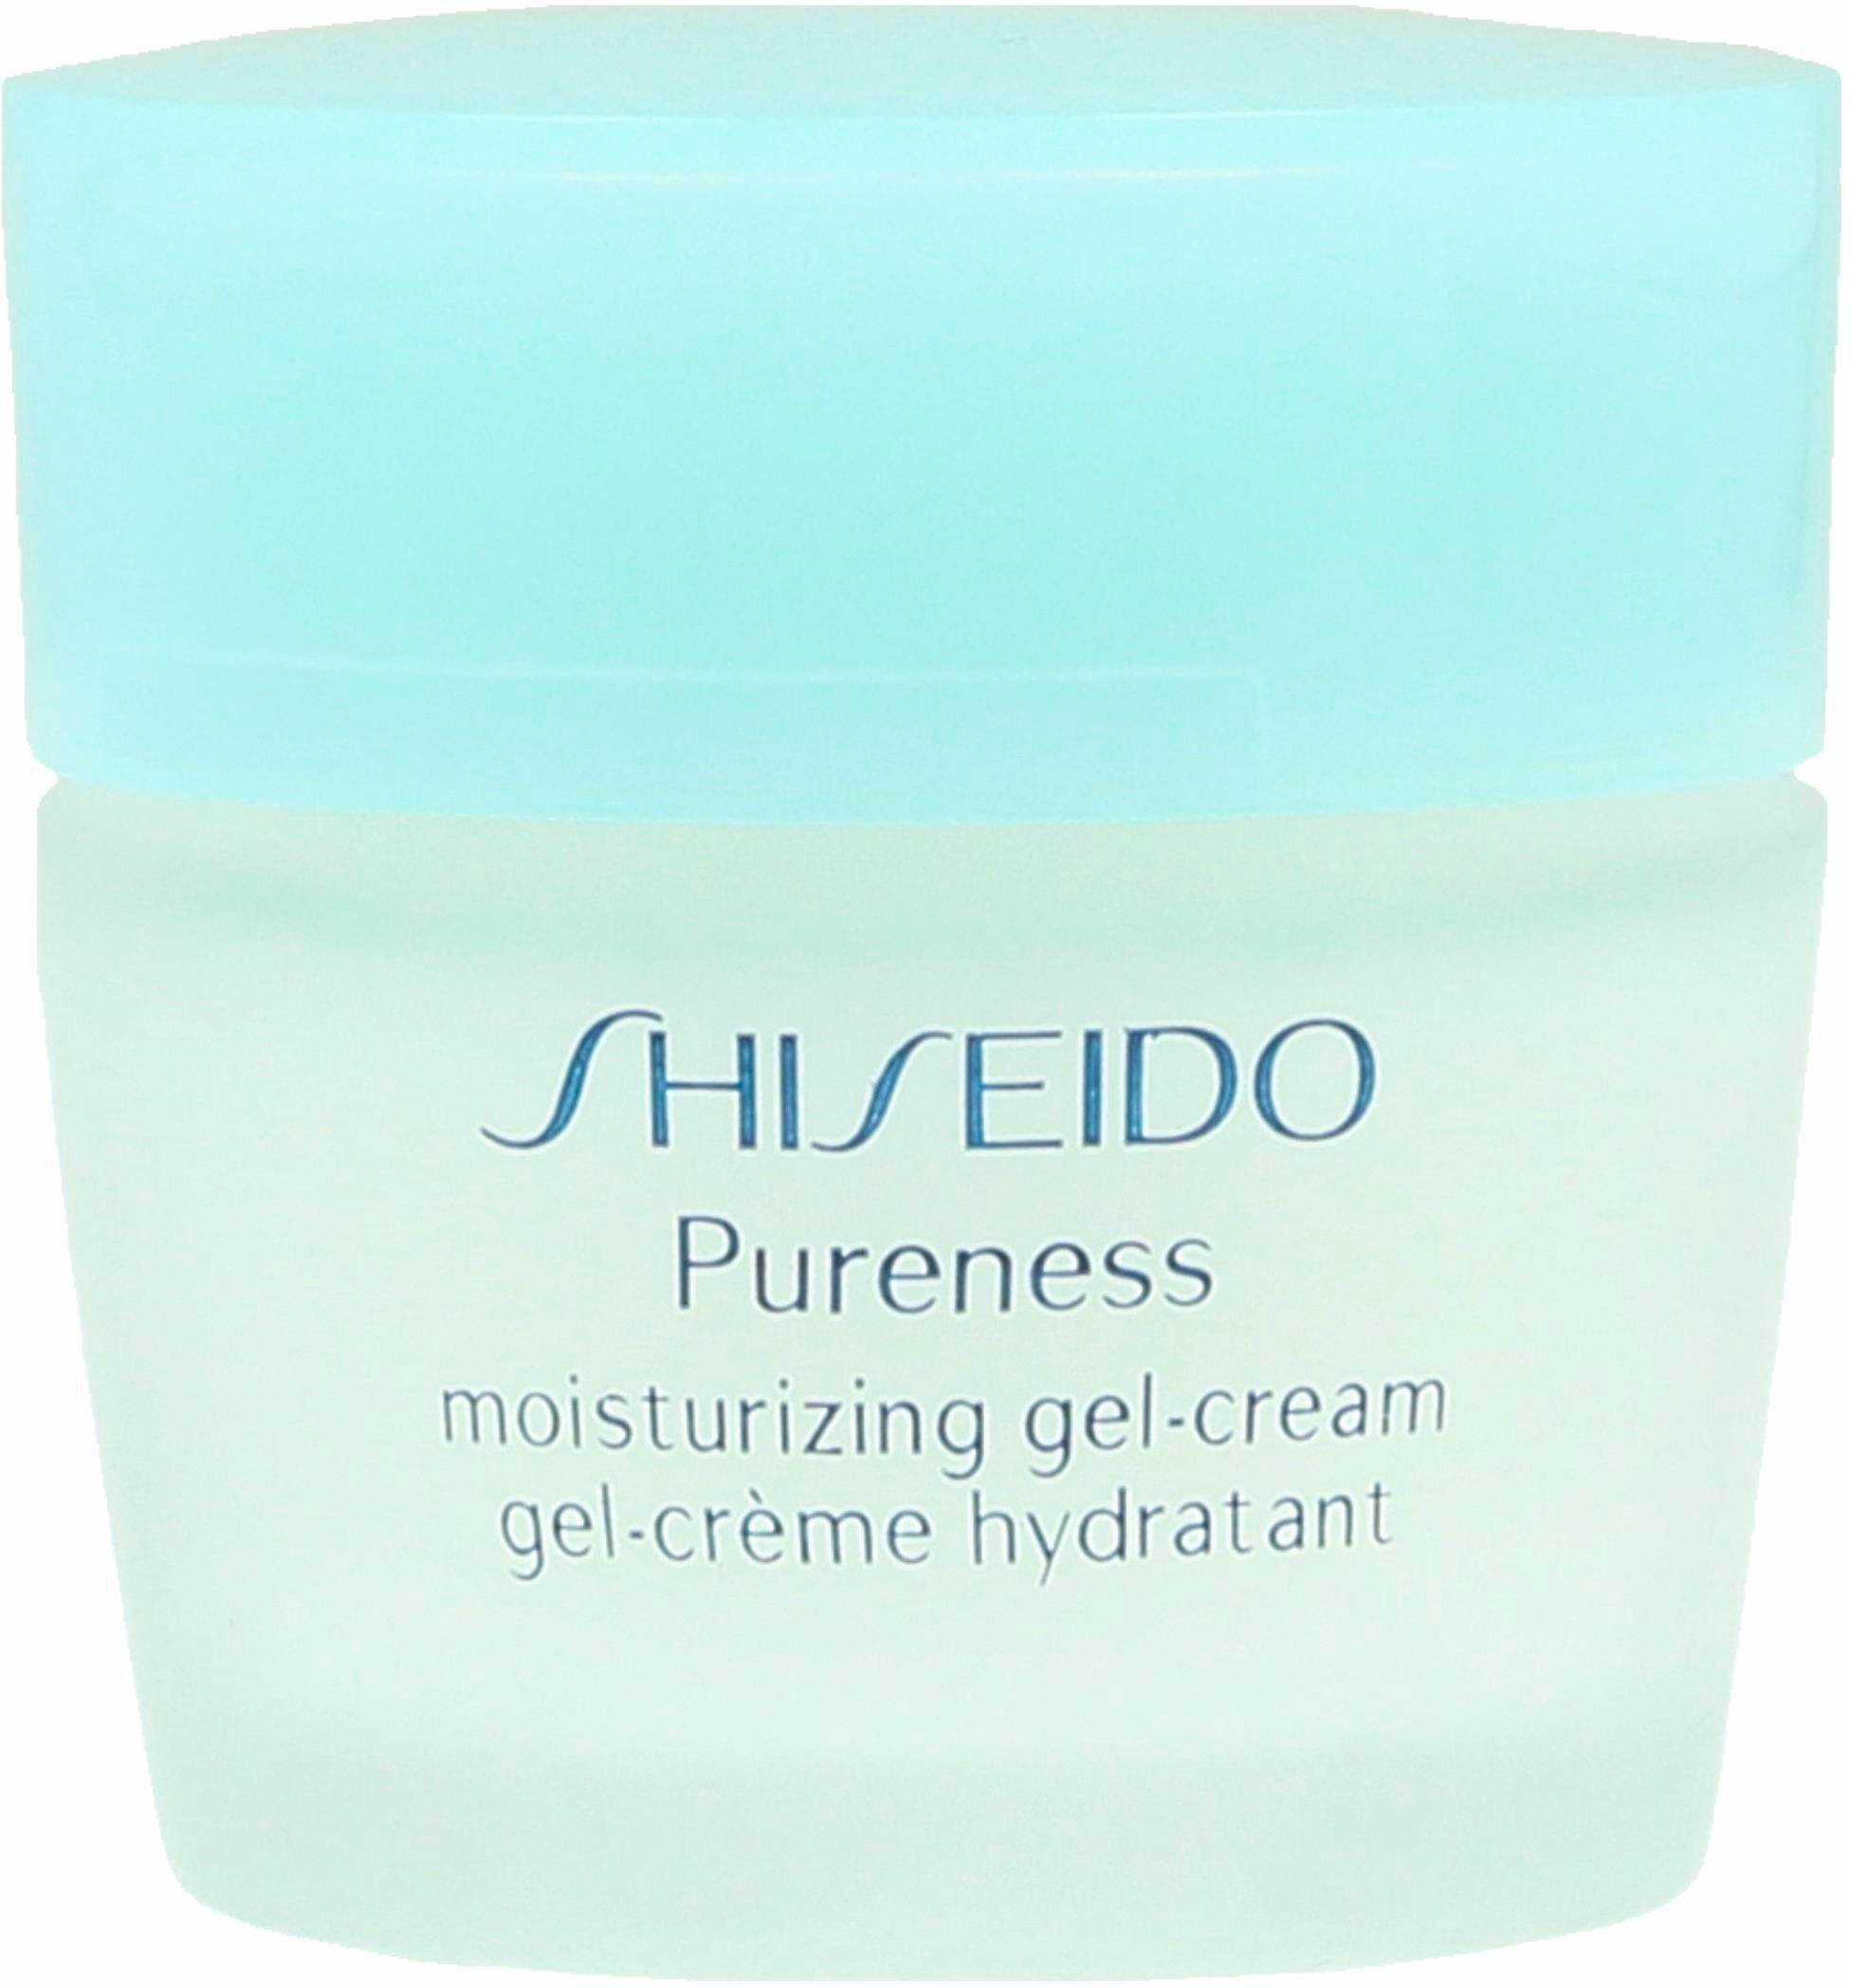 Shiseido, »Pureness Moisturizing Gel-Cream«, Gesichtscreme